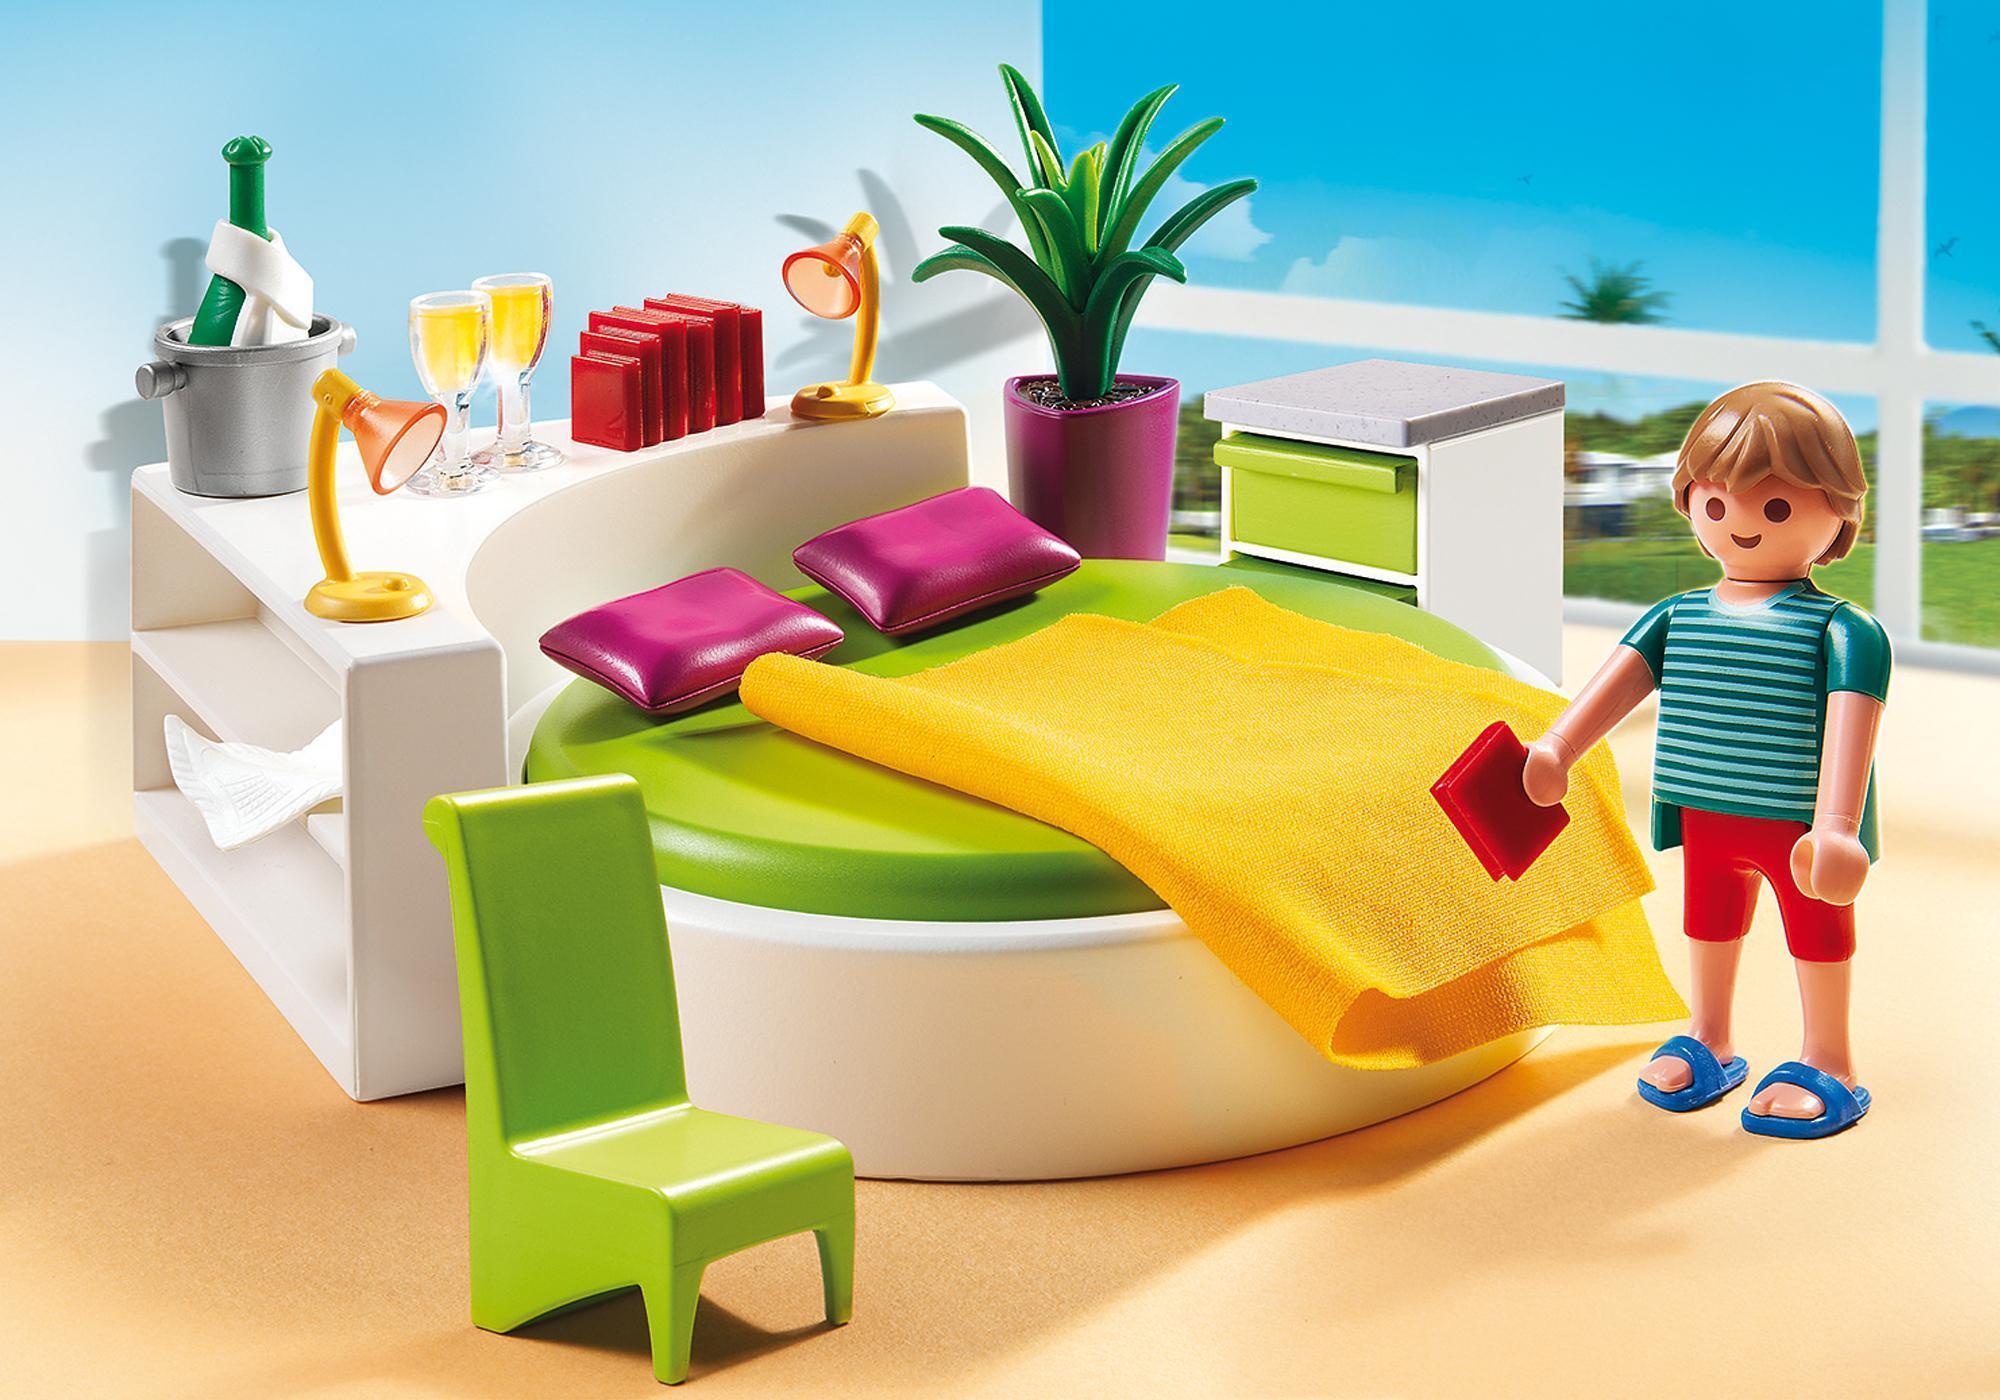 http://media.playmobil.com/i/playmobil/5583_product_detail/Okrągłe łóżko